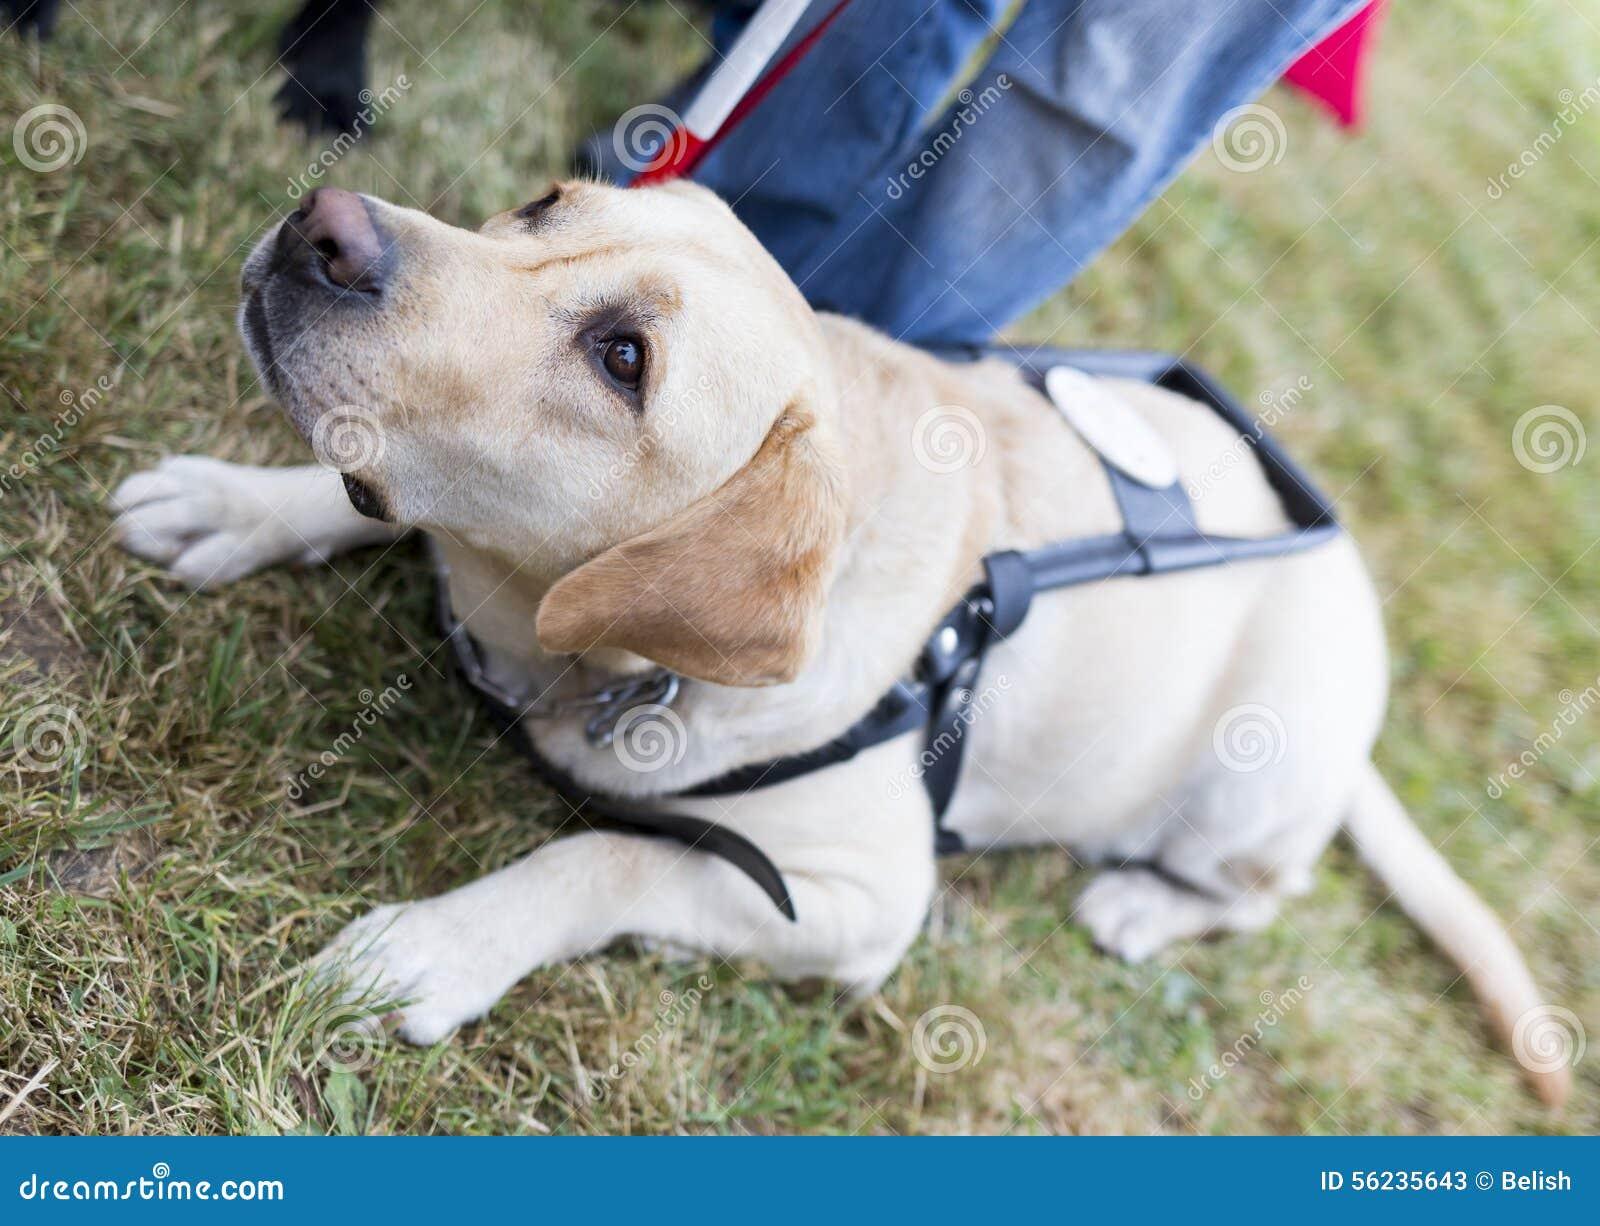 Labrador Dog Training Video Free Download